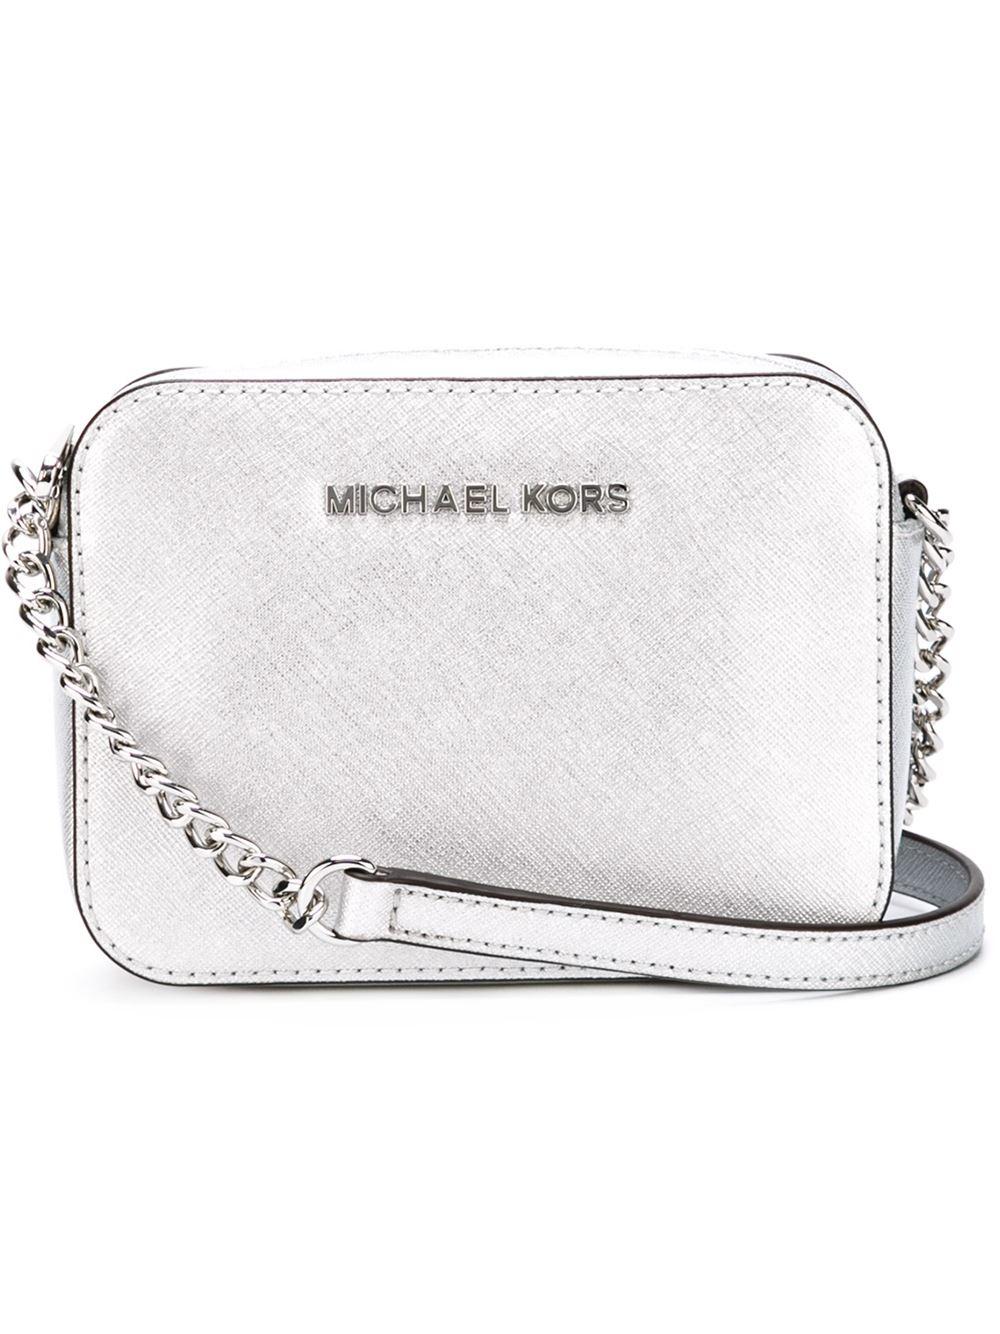 441855fd2418 MICHAEL Michael Kors Jet Set Travel Mini Cross-Body Bag in Metallic ...